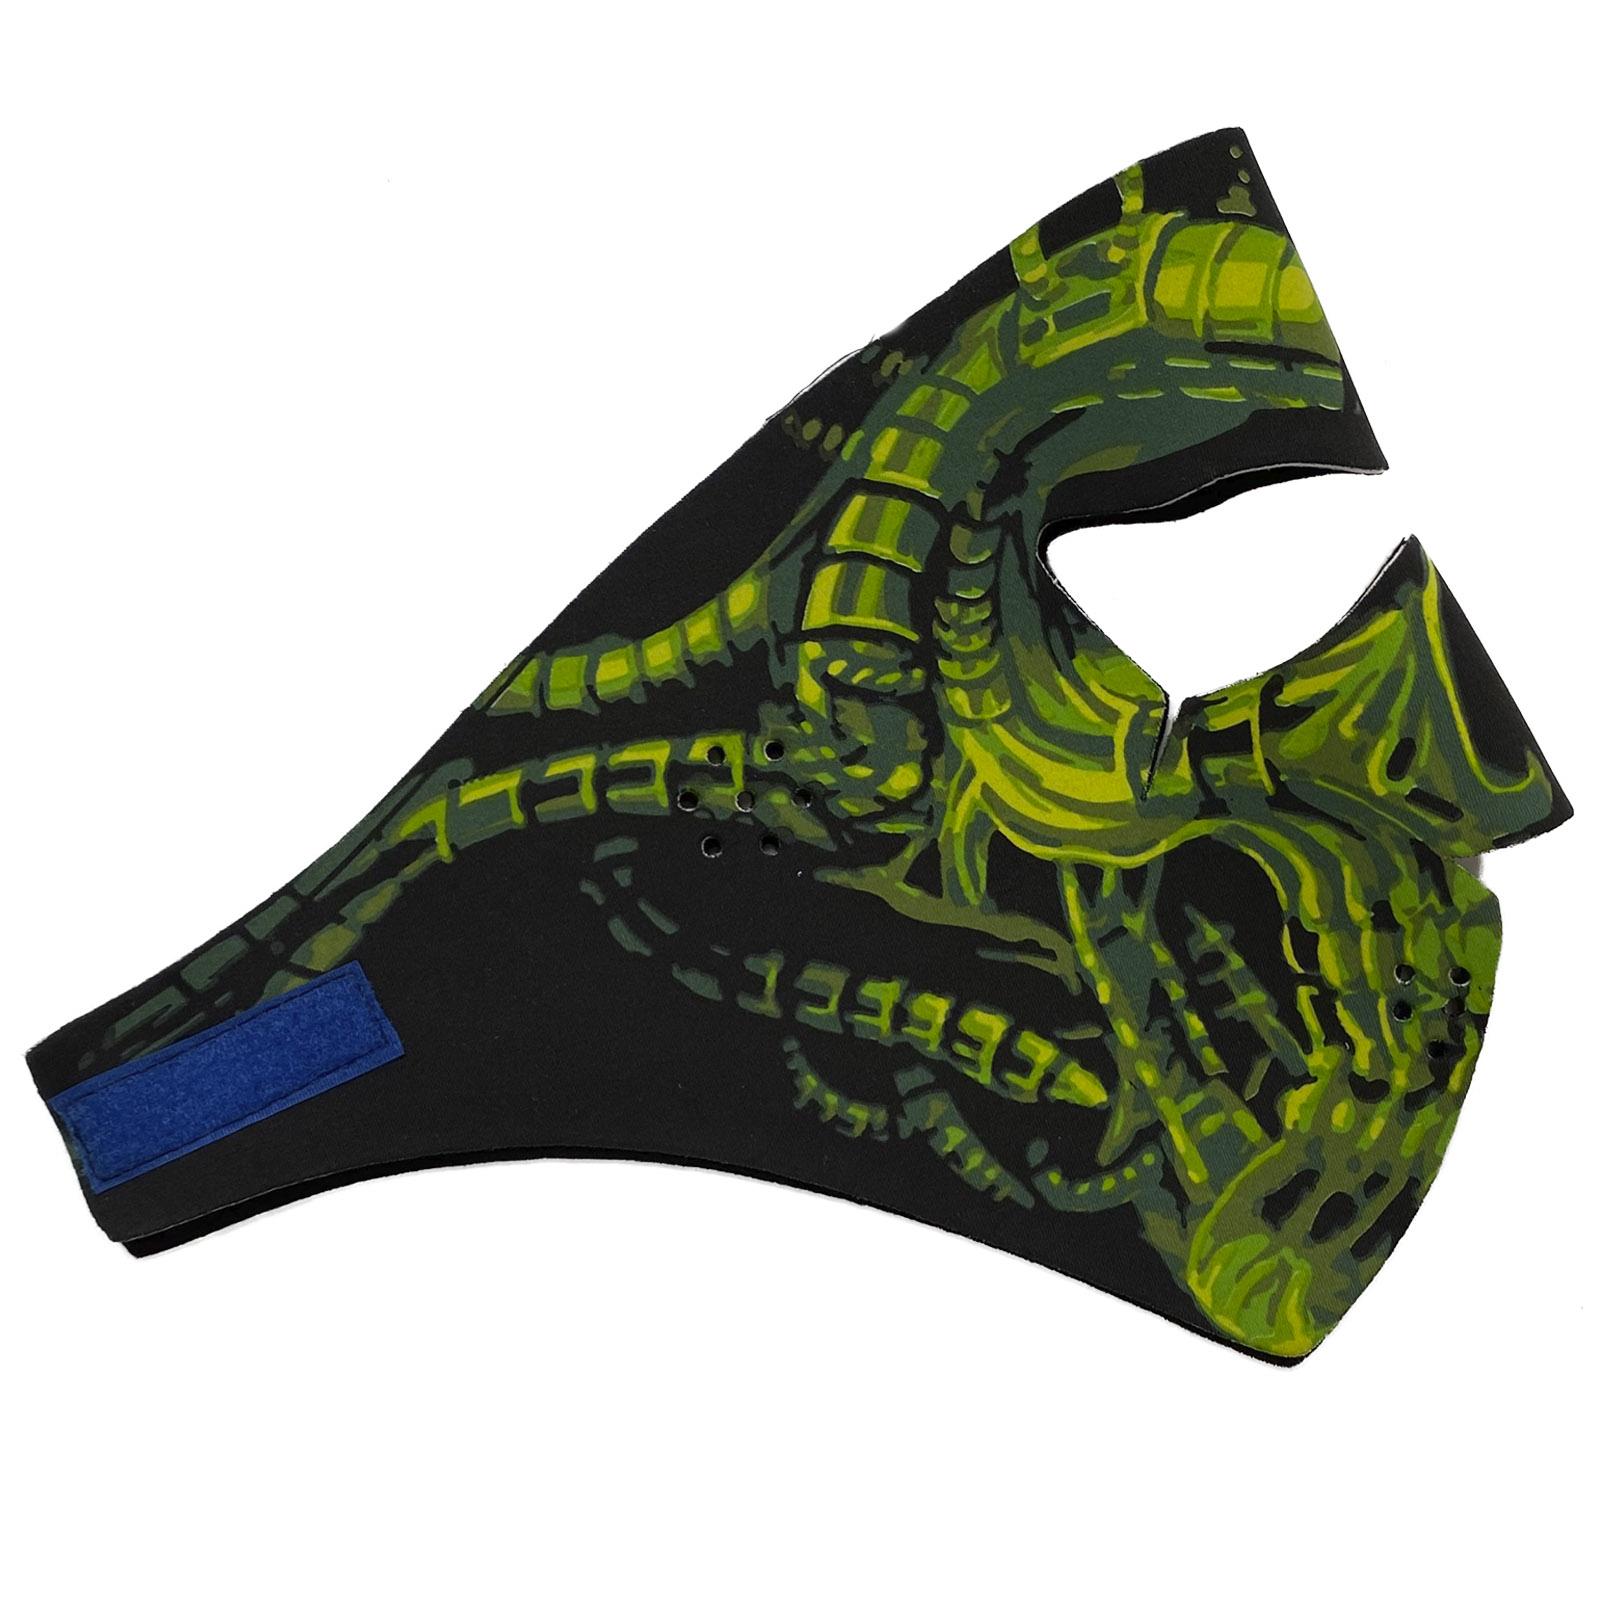 Крутая защитная маска Skulskinz Monstro